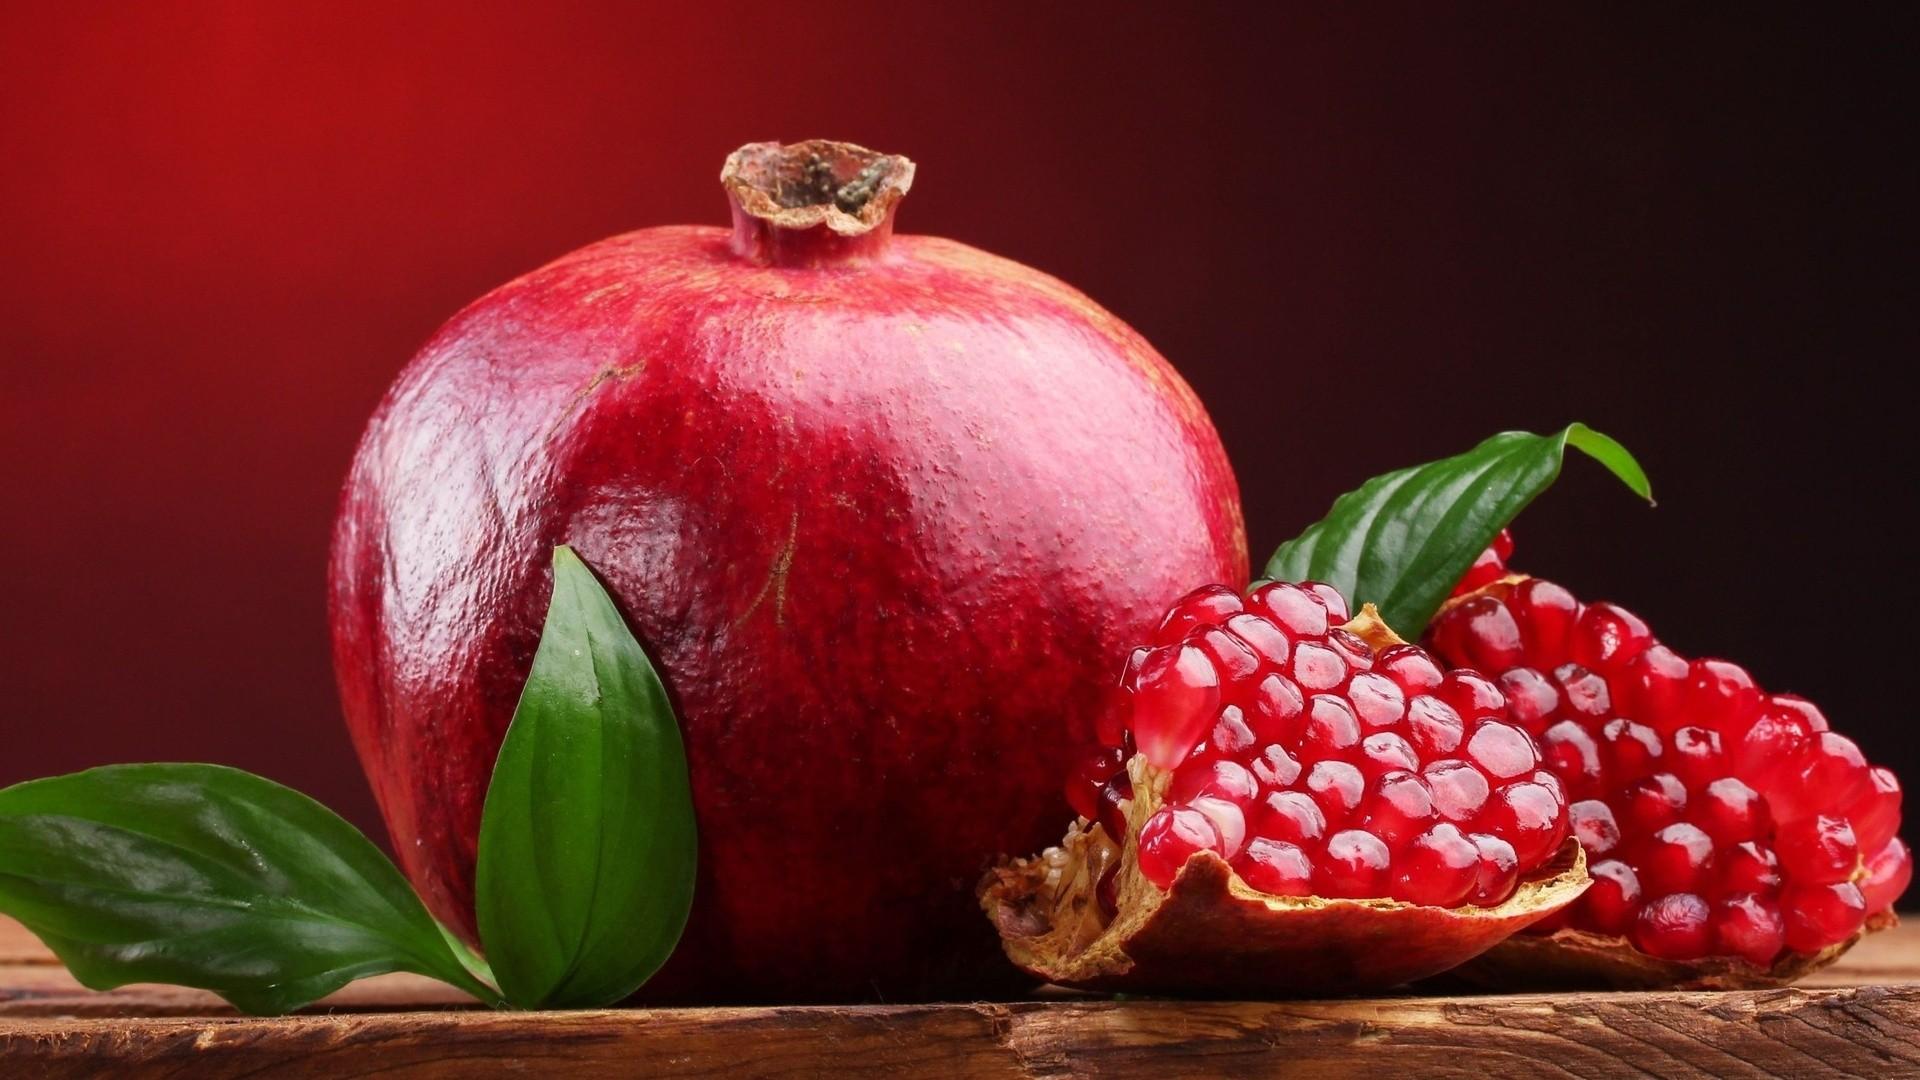 Pomegranate background wallpaper